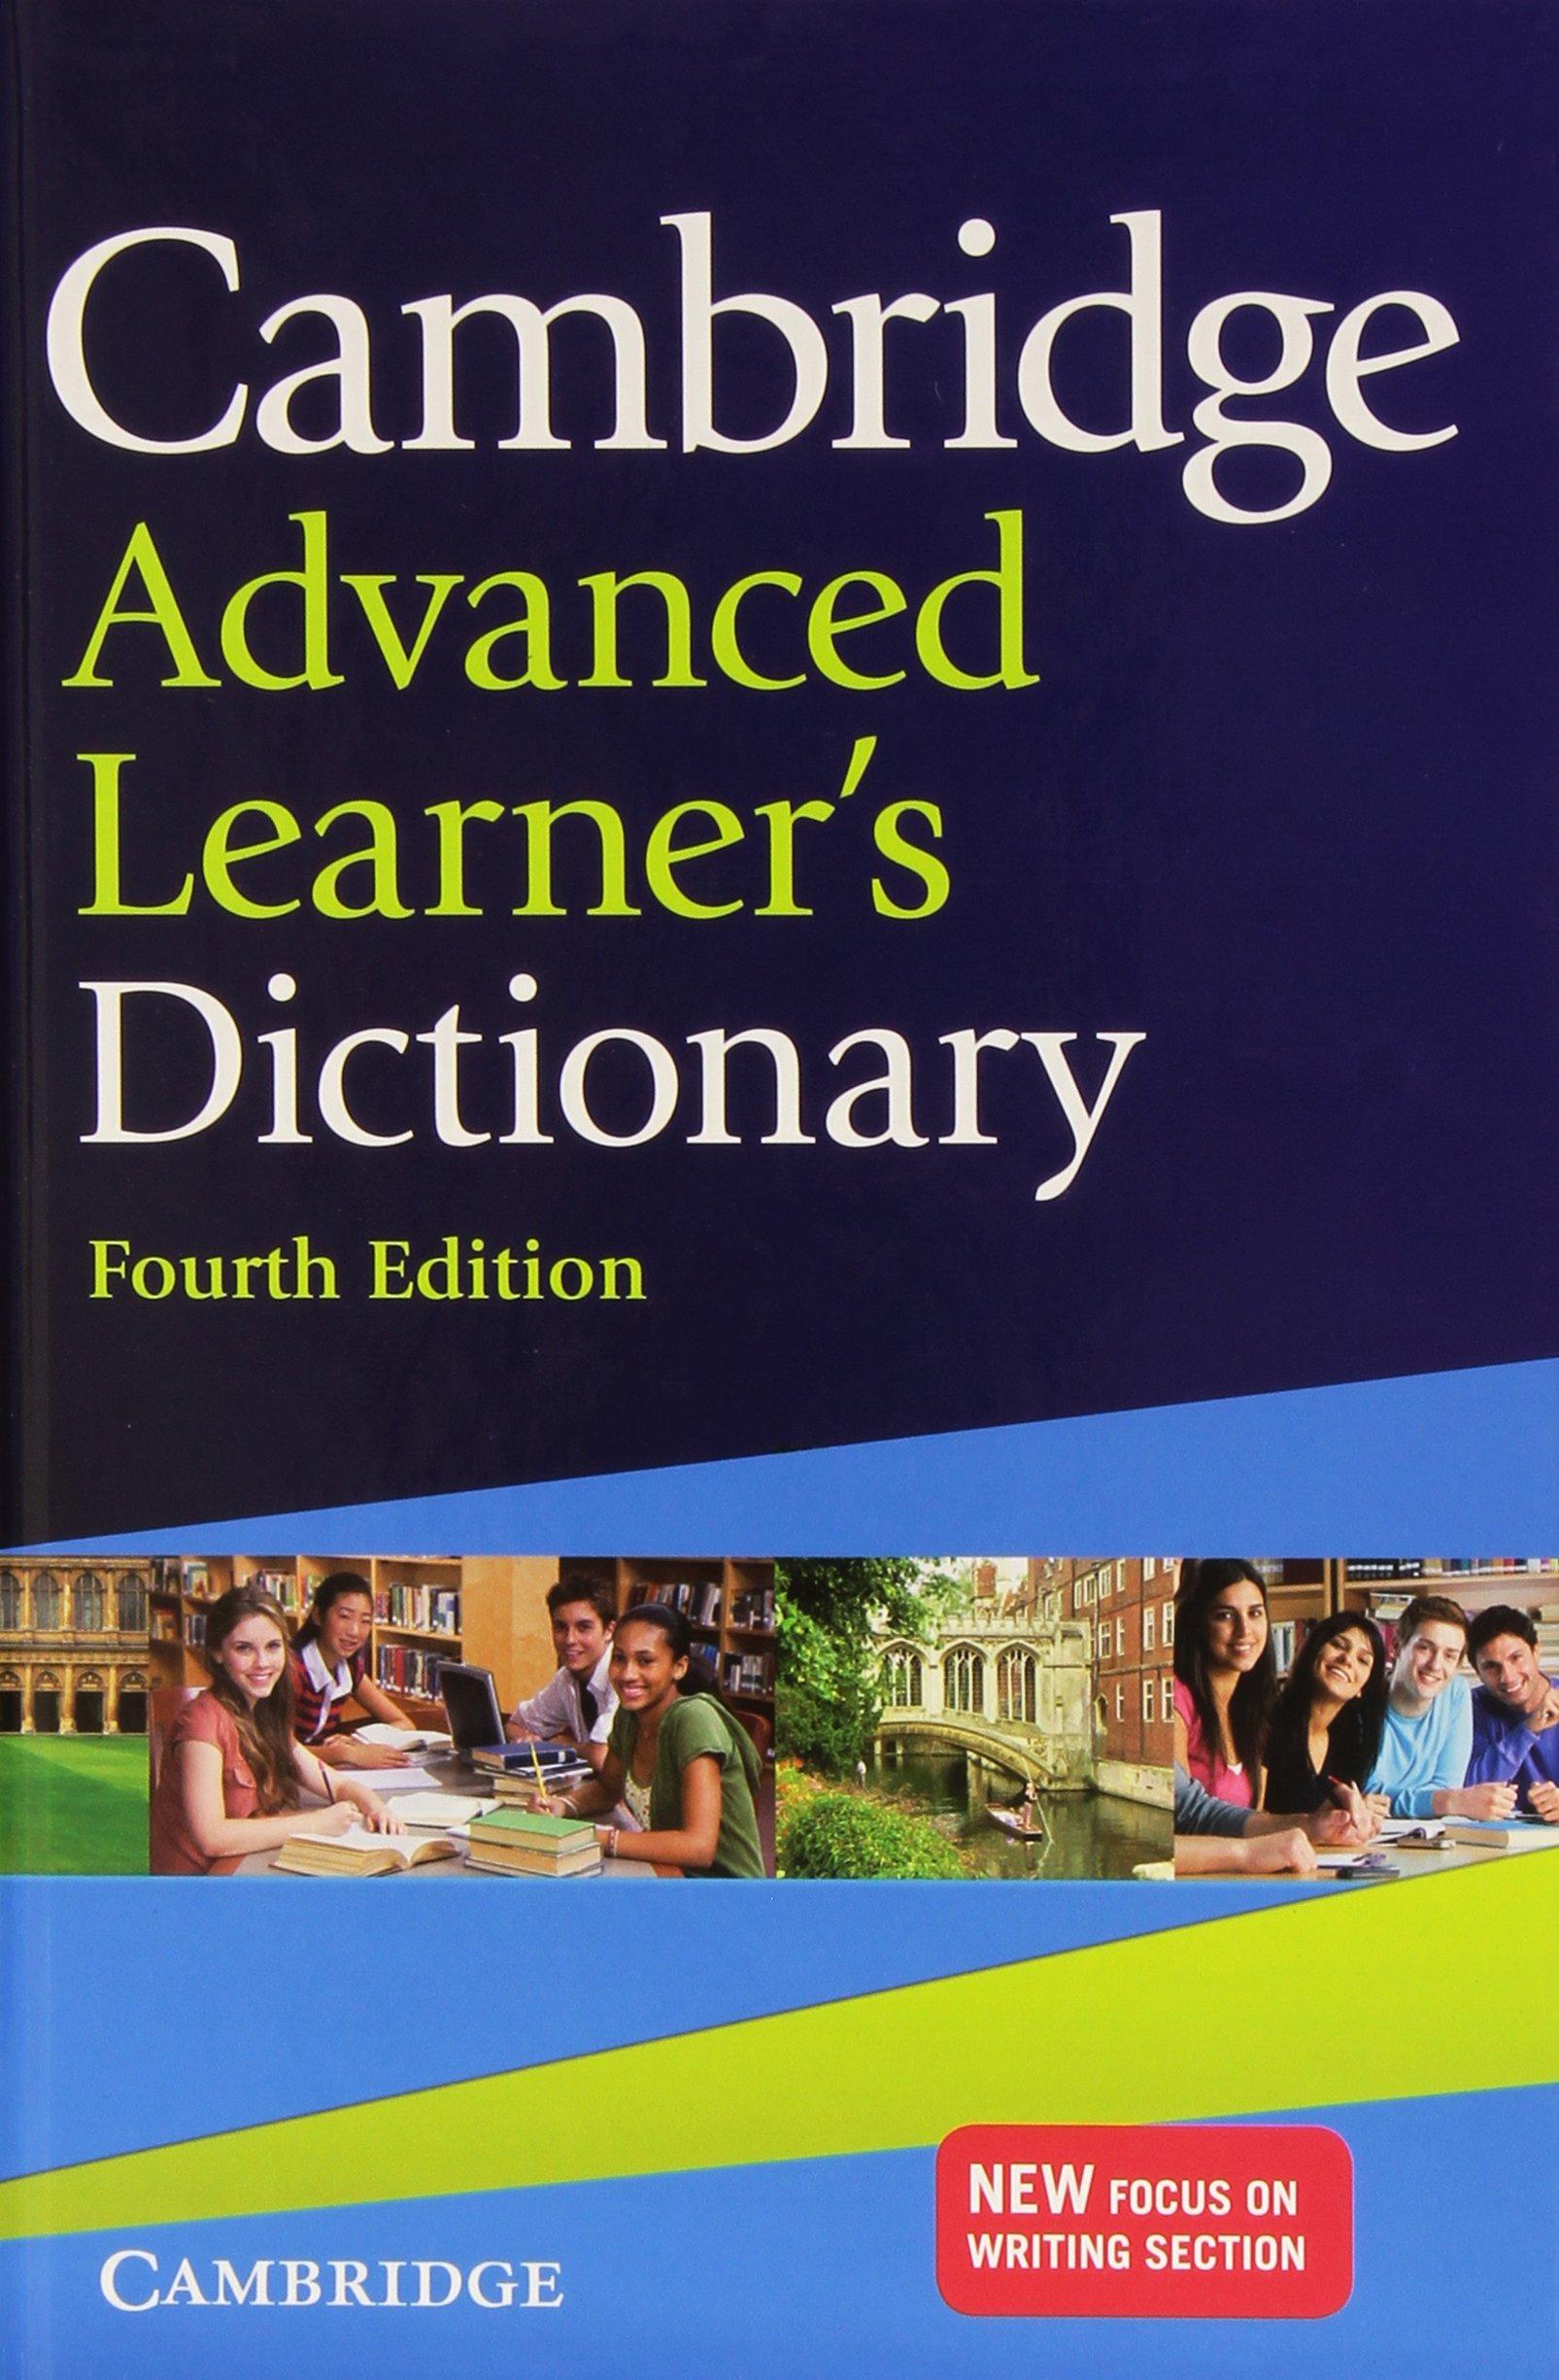 Cambridge Advanced Learner's Dictionary  Mcintosh, Colin Amazon ...